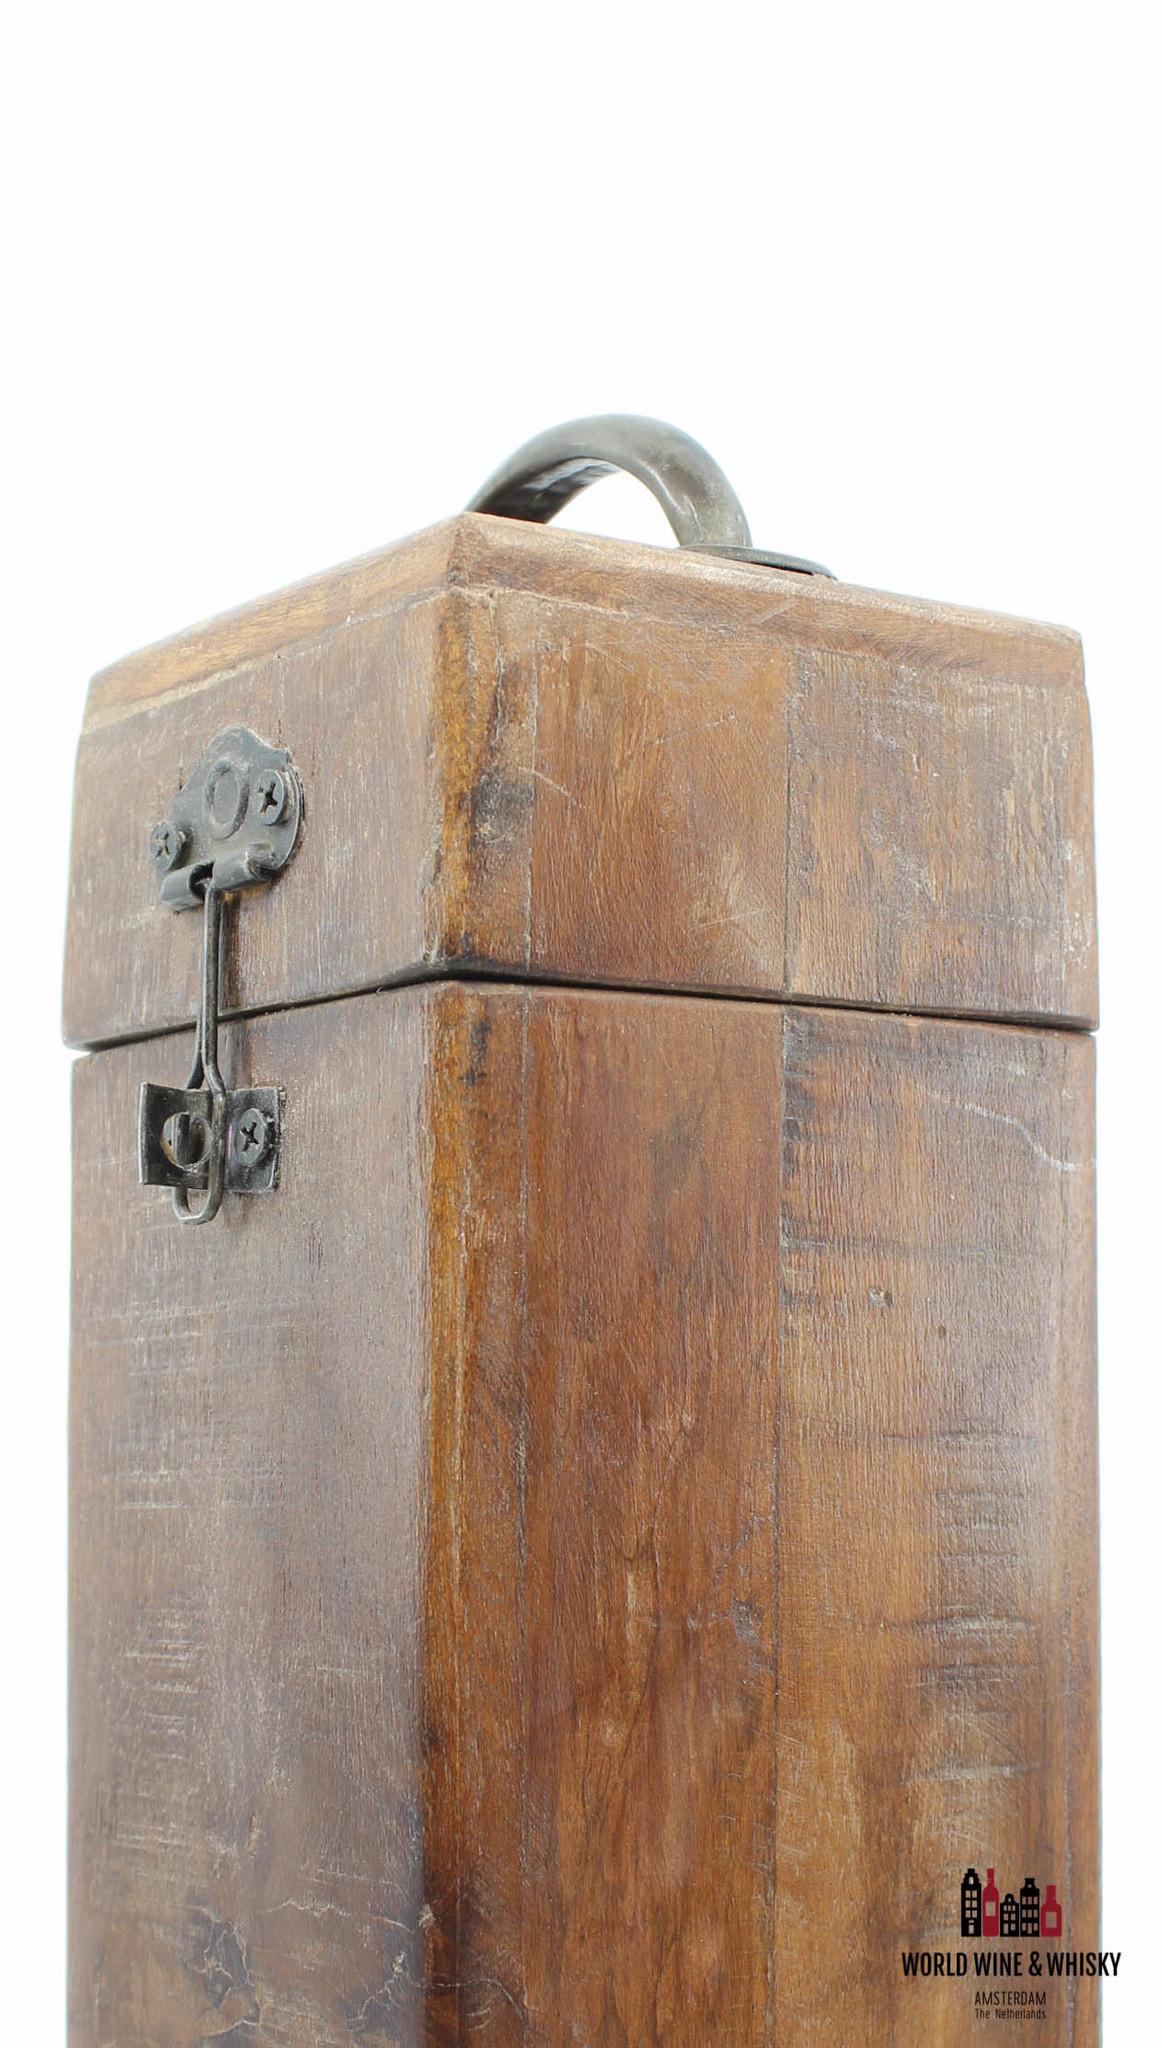 Giftbox Luxury wooden wine or whisky giftbox (1 bottle)